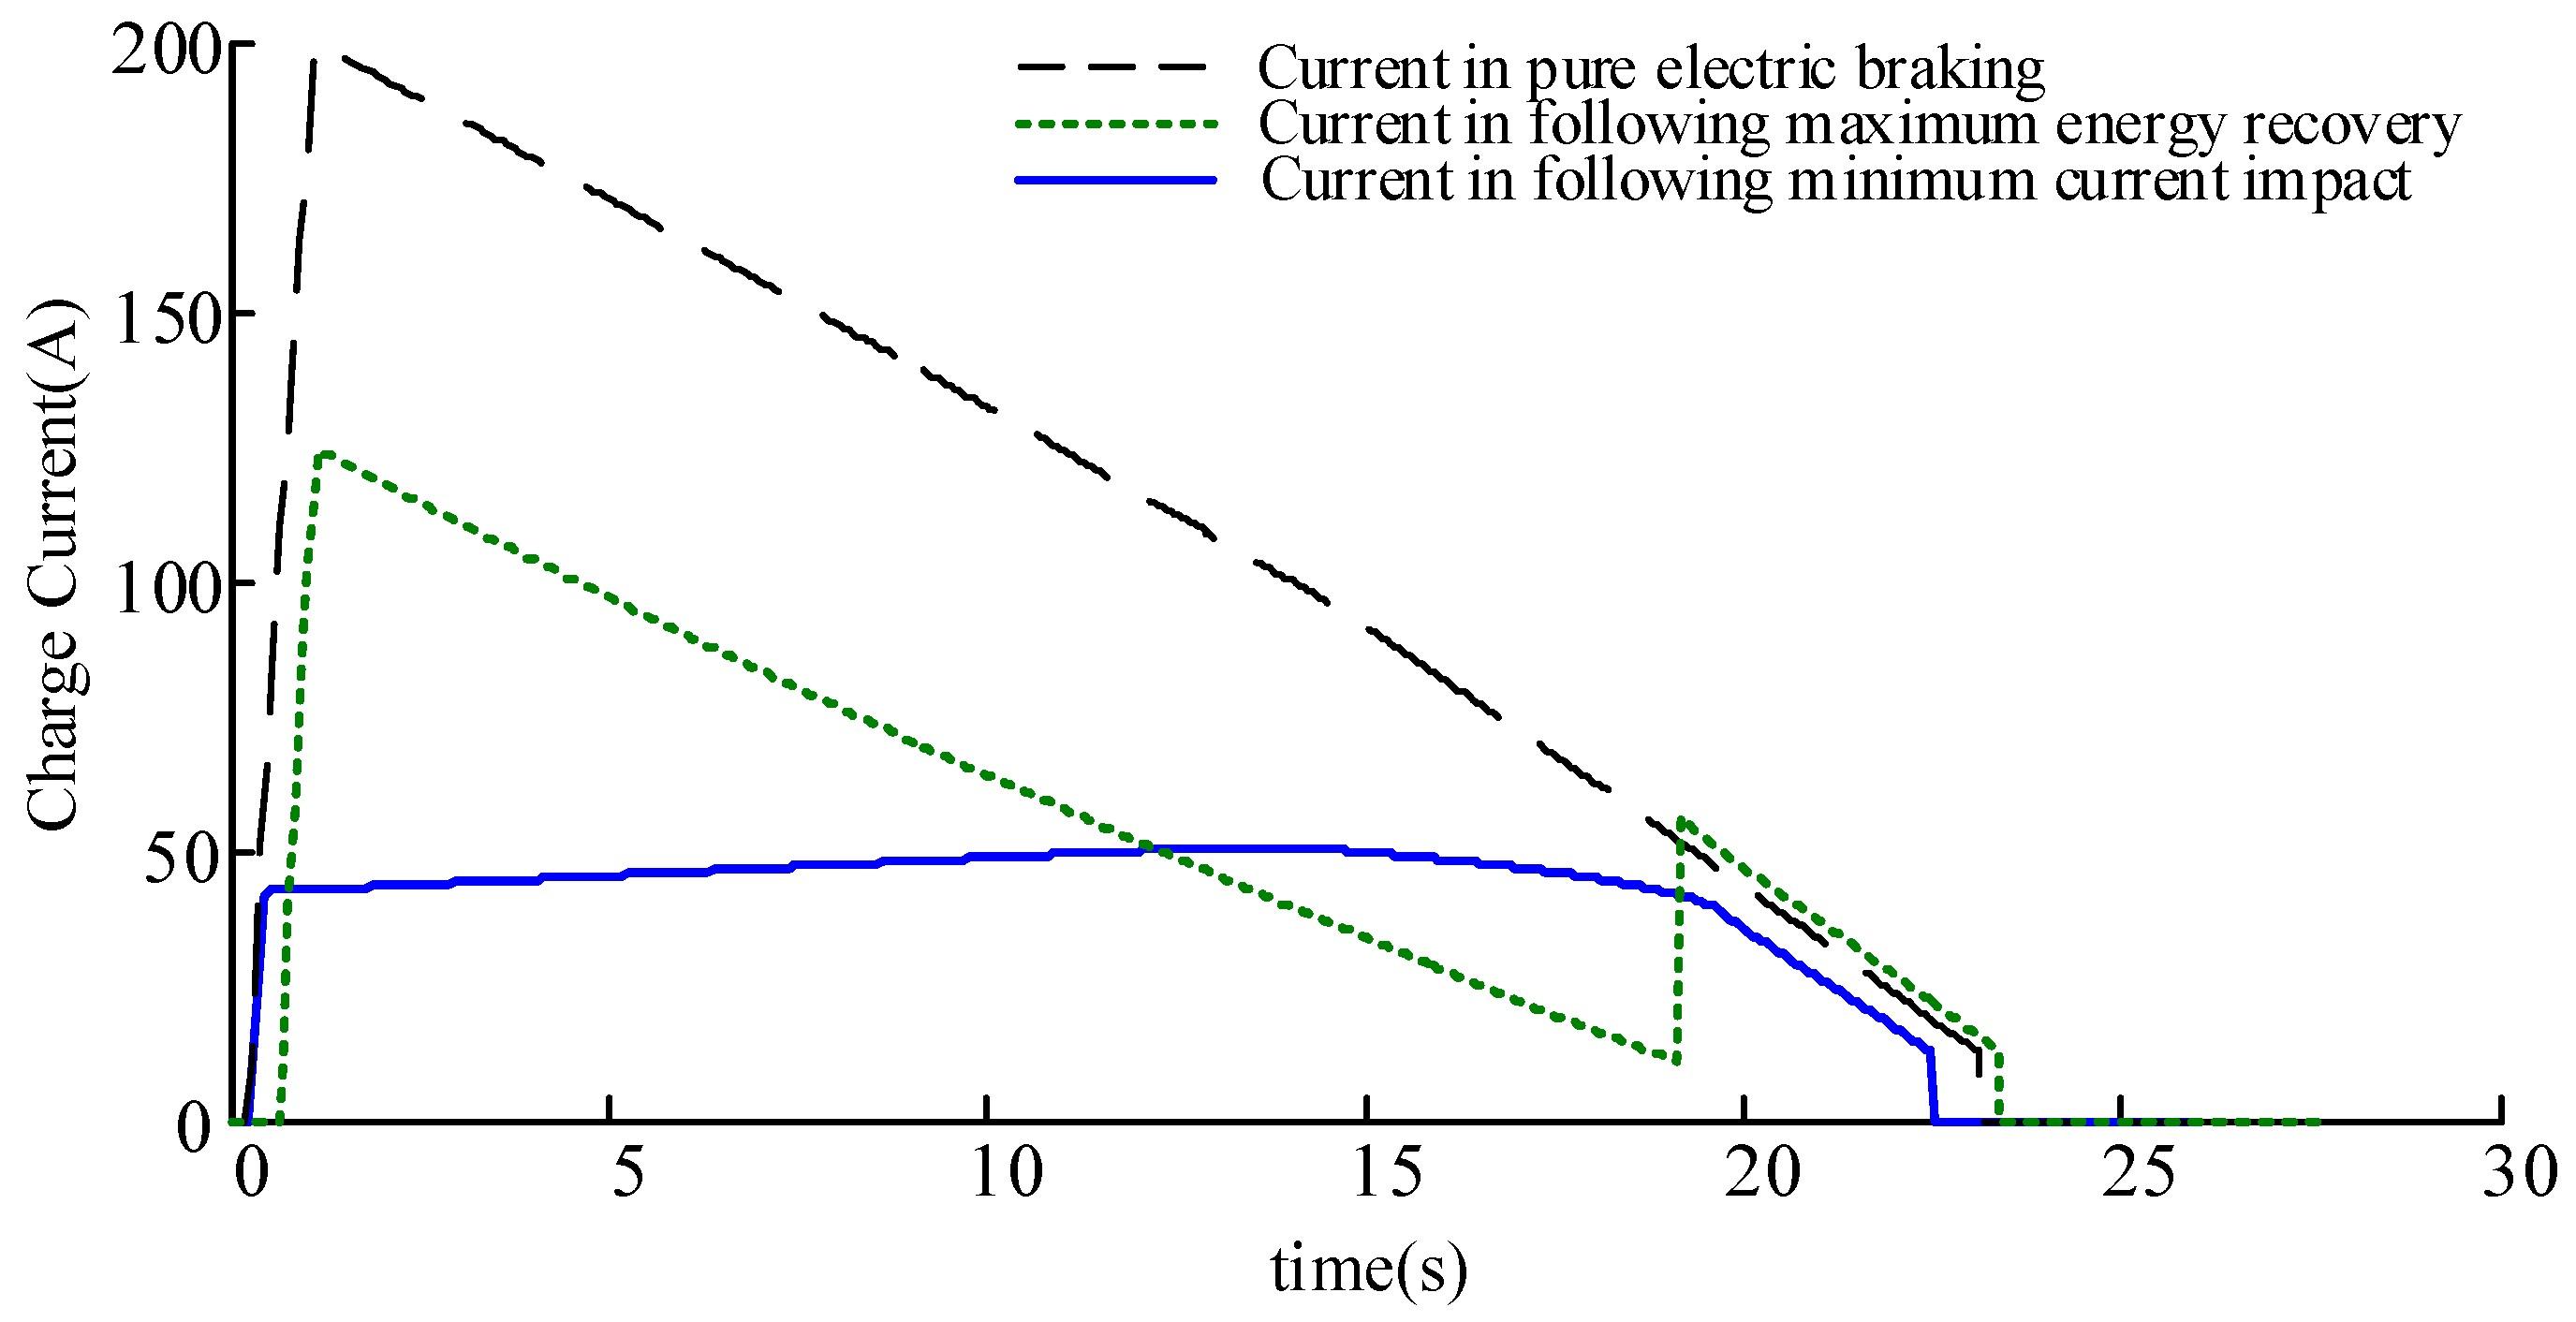 Regenerative Braking Diagram Energies Free Full Text Of Regenerative Braking Diagram